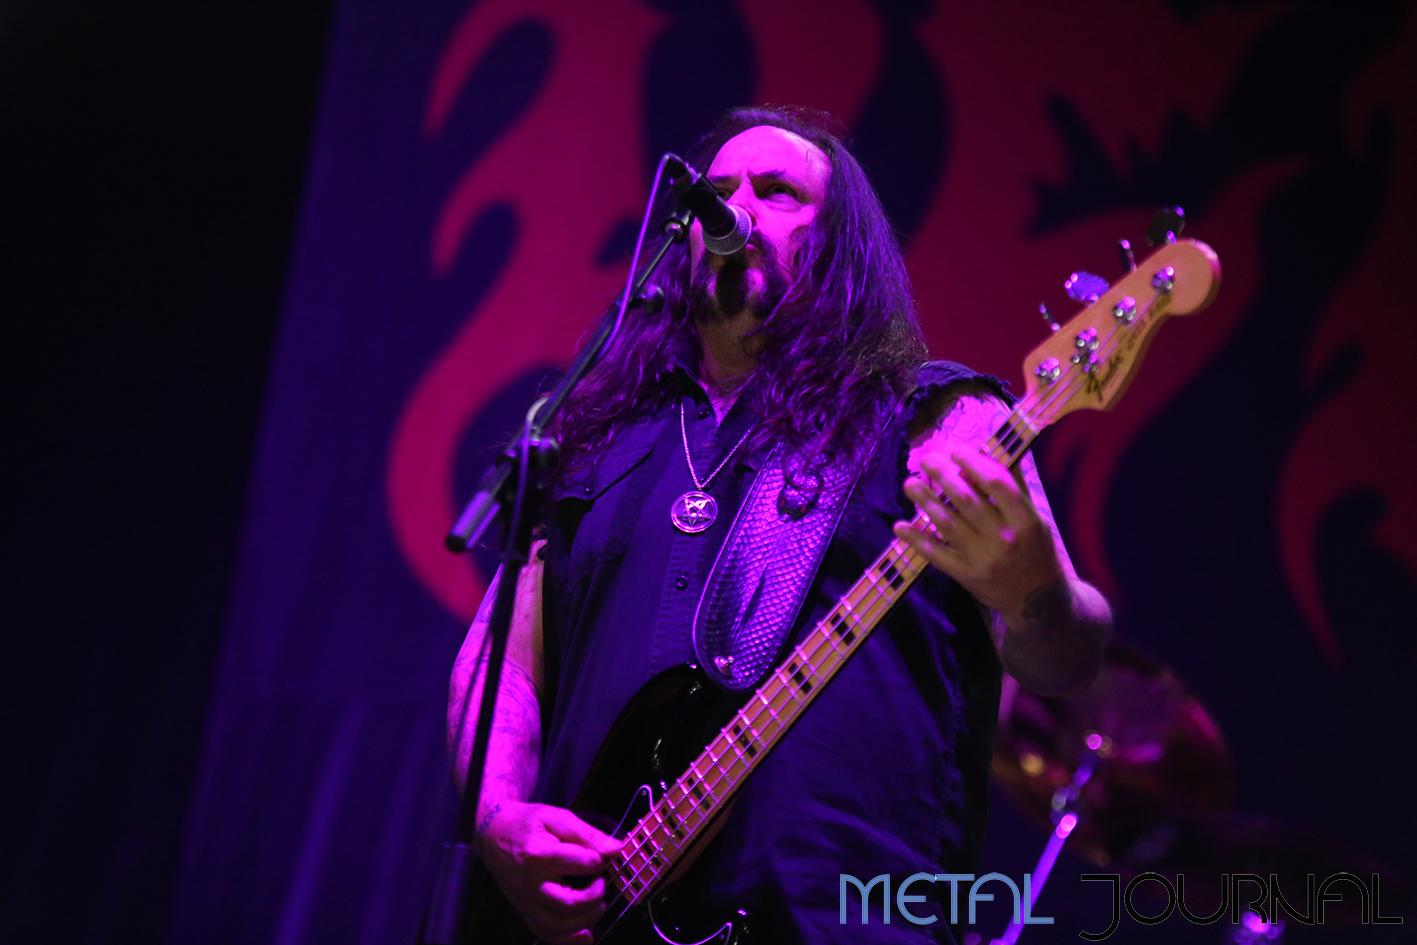 deicide - leyendas del rock 2019 metal journal pic 5